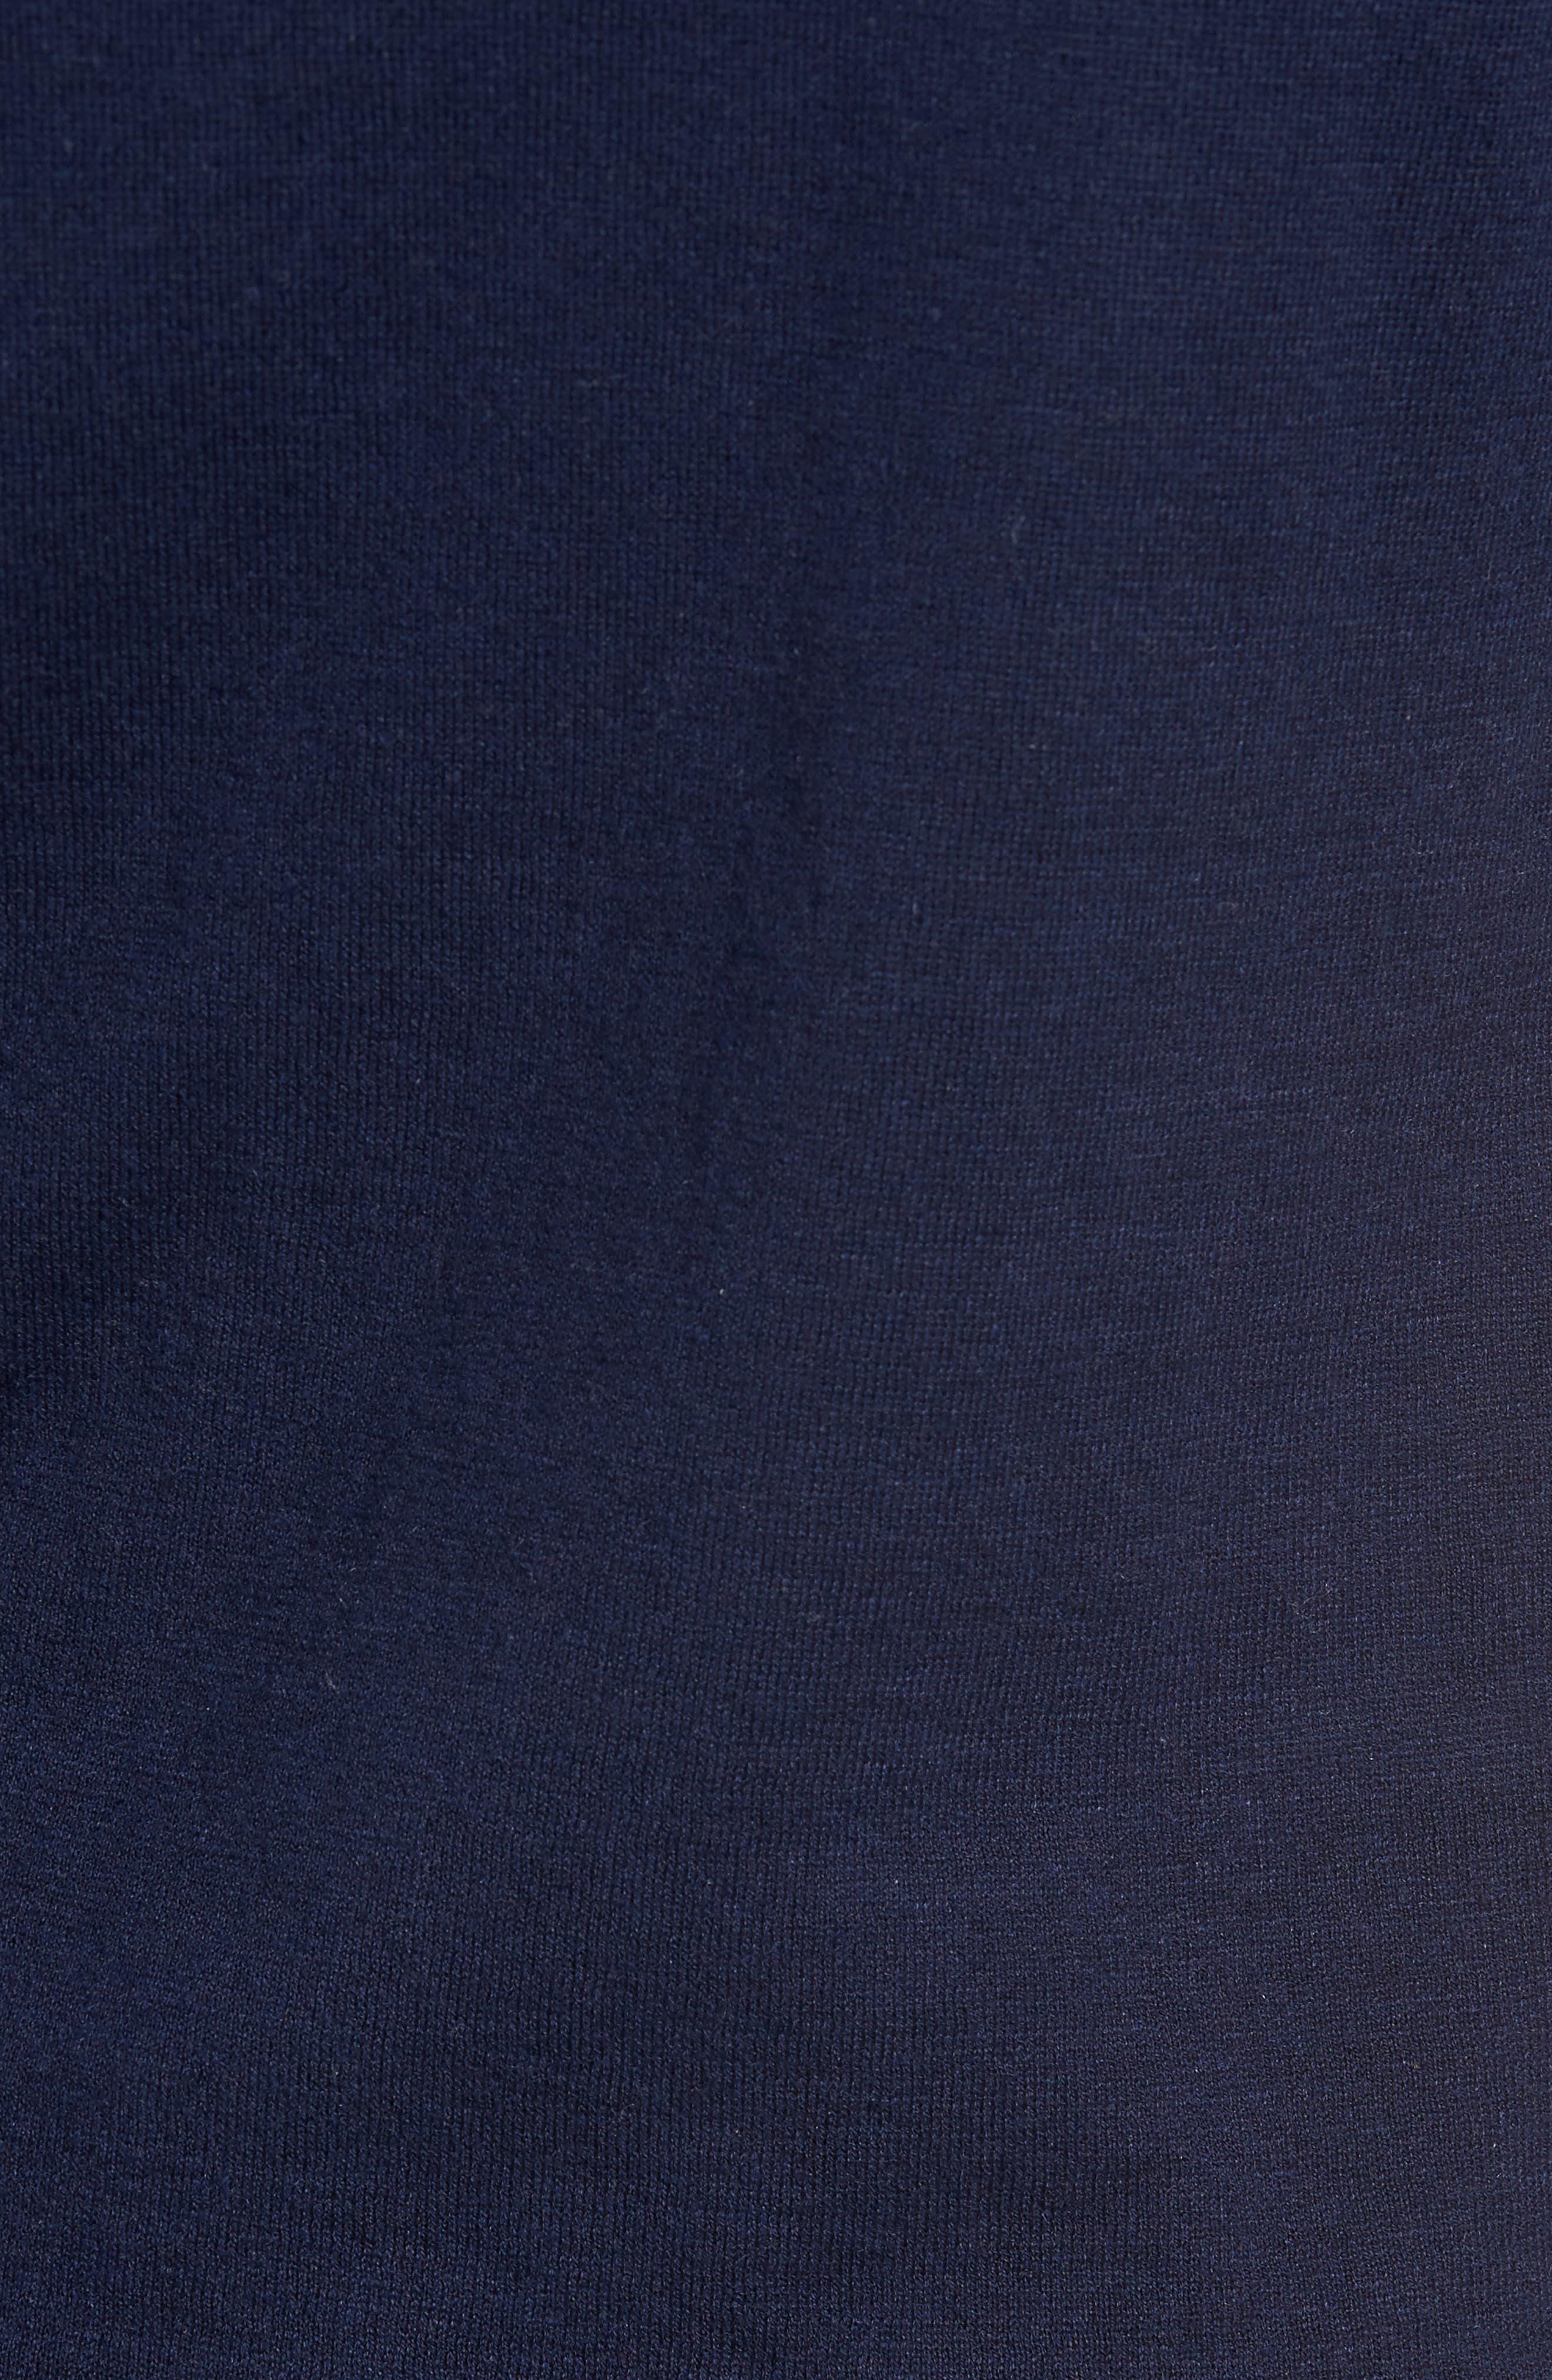 Alternate Image 5  - Nordstrom Men's Shop Long Sleeve Cotton & Linen Blend Henley